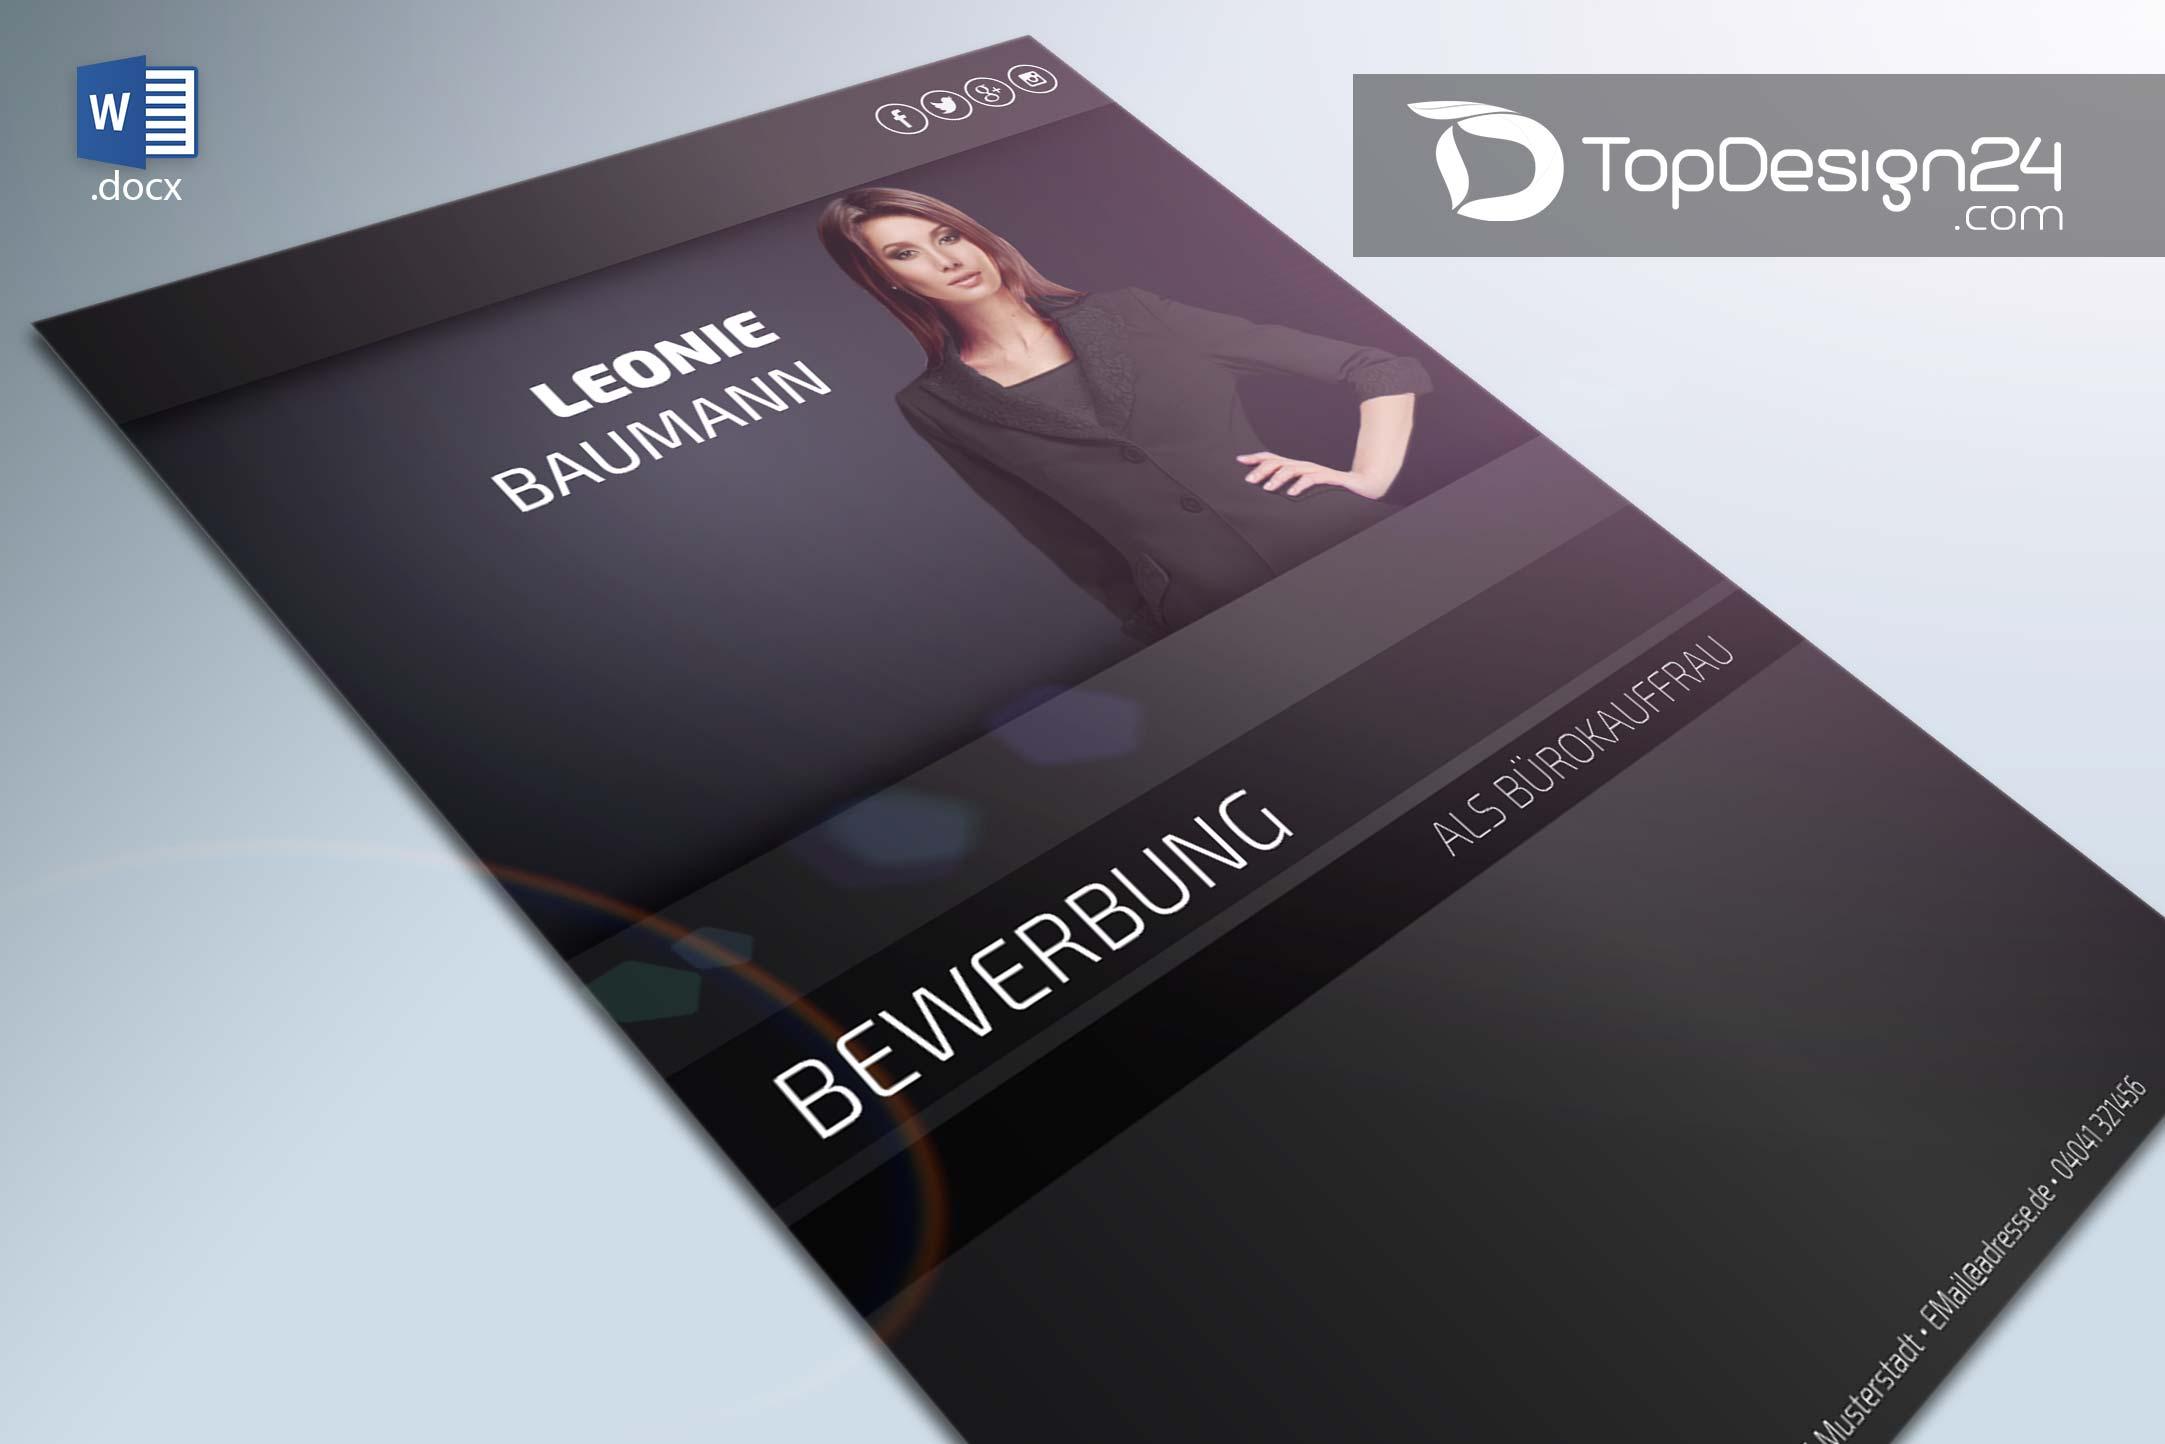 Deckblatt Design Word Topdesign24